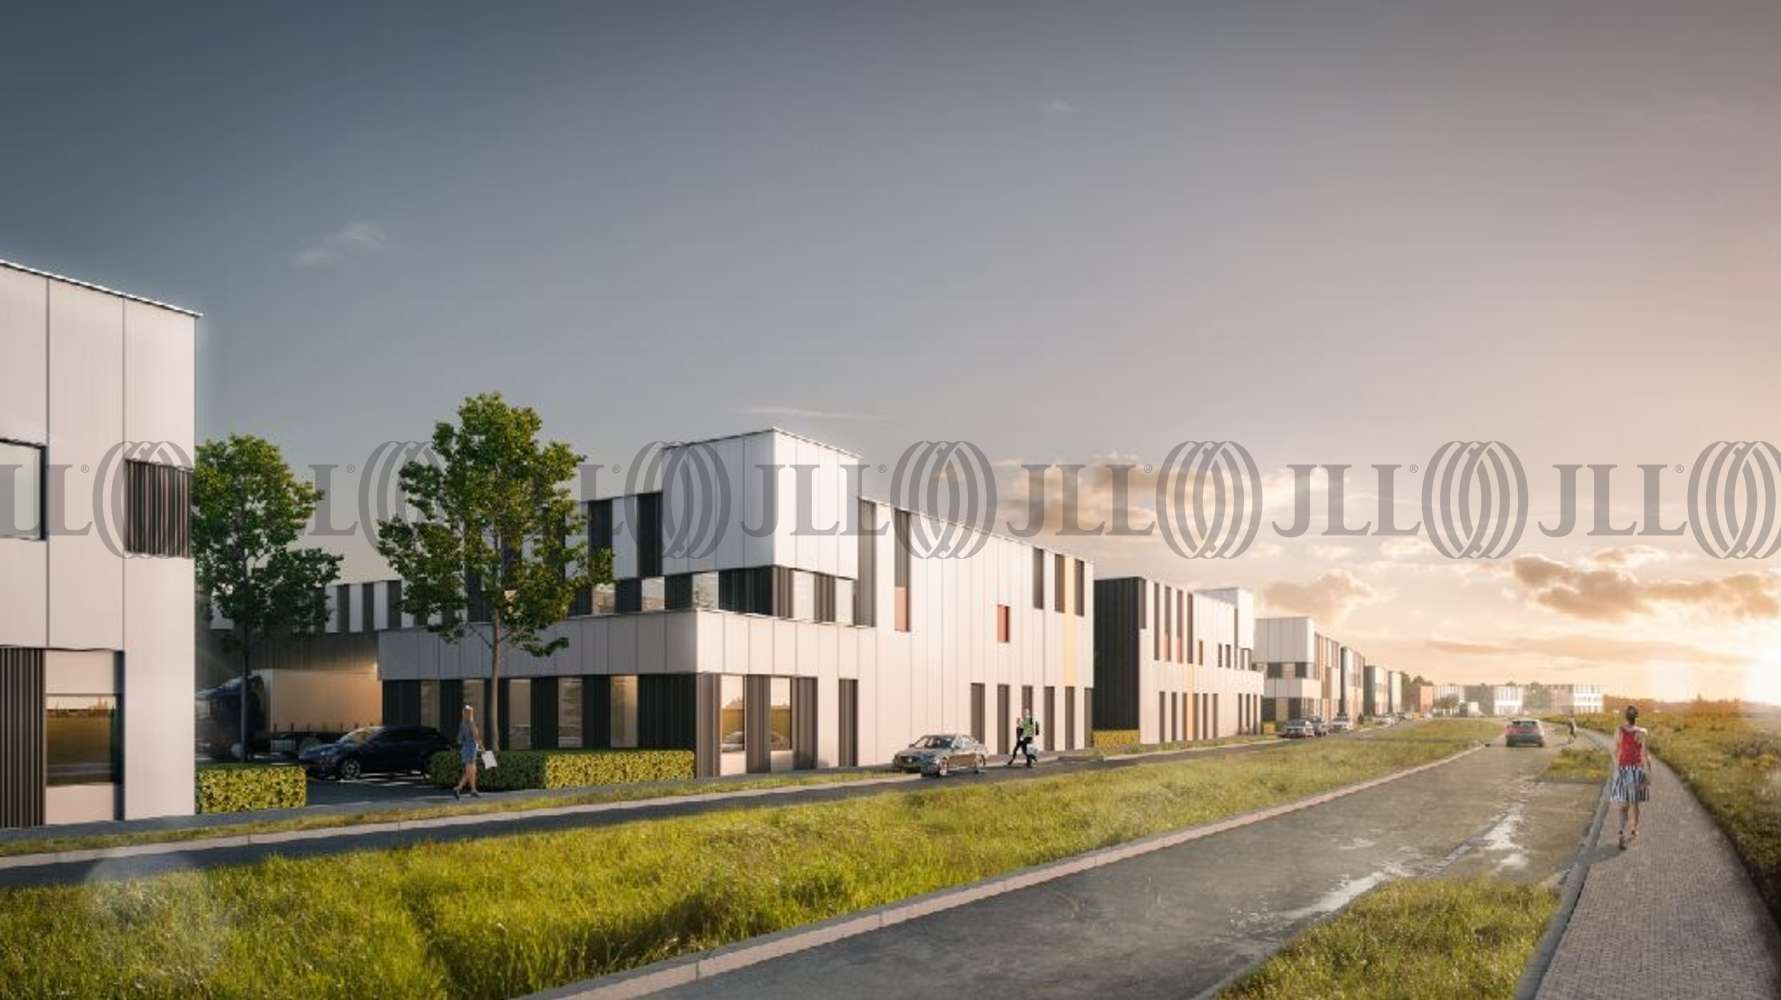 Activités/entrepôt Tremblay en france, 93290 - ZAC AEROLIANS (CLUSTER-PARC LOCATIF) A3 - 10869502